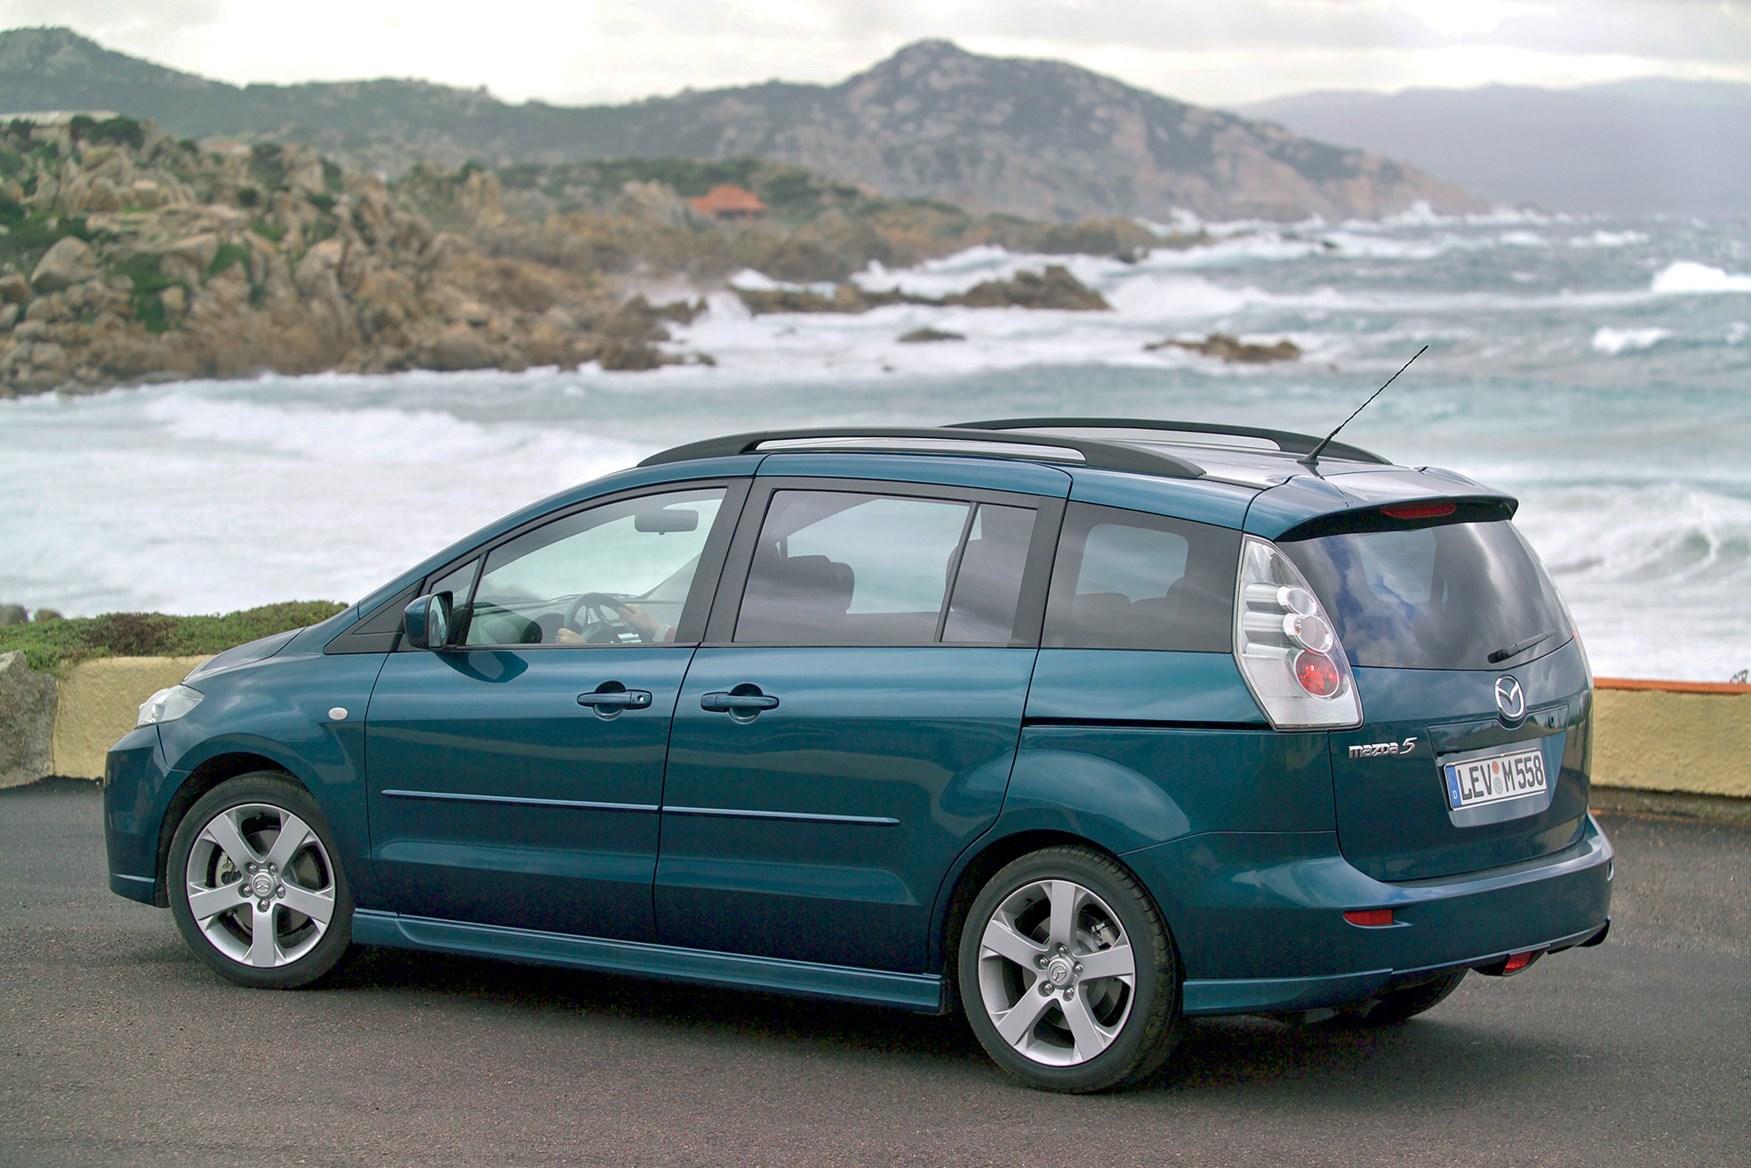 Mazda Dealer New Braunfels >> Mazda 5 Used Car For Sale | adanih.com